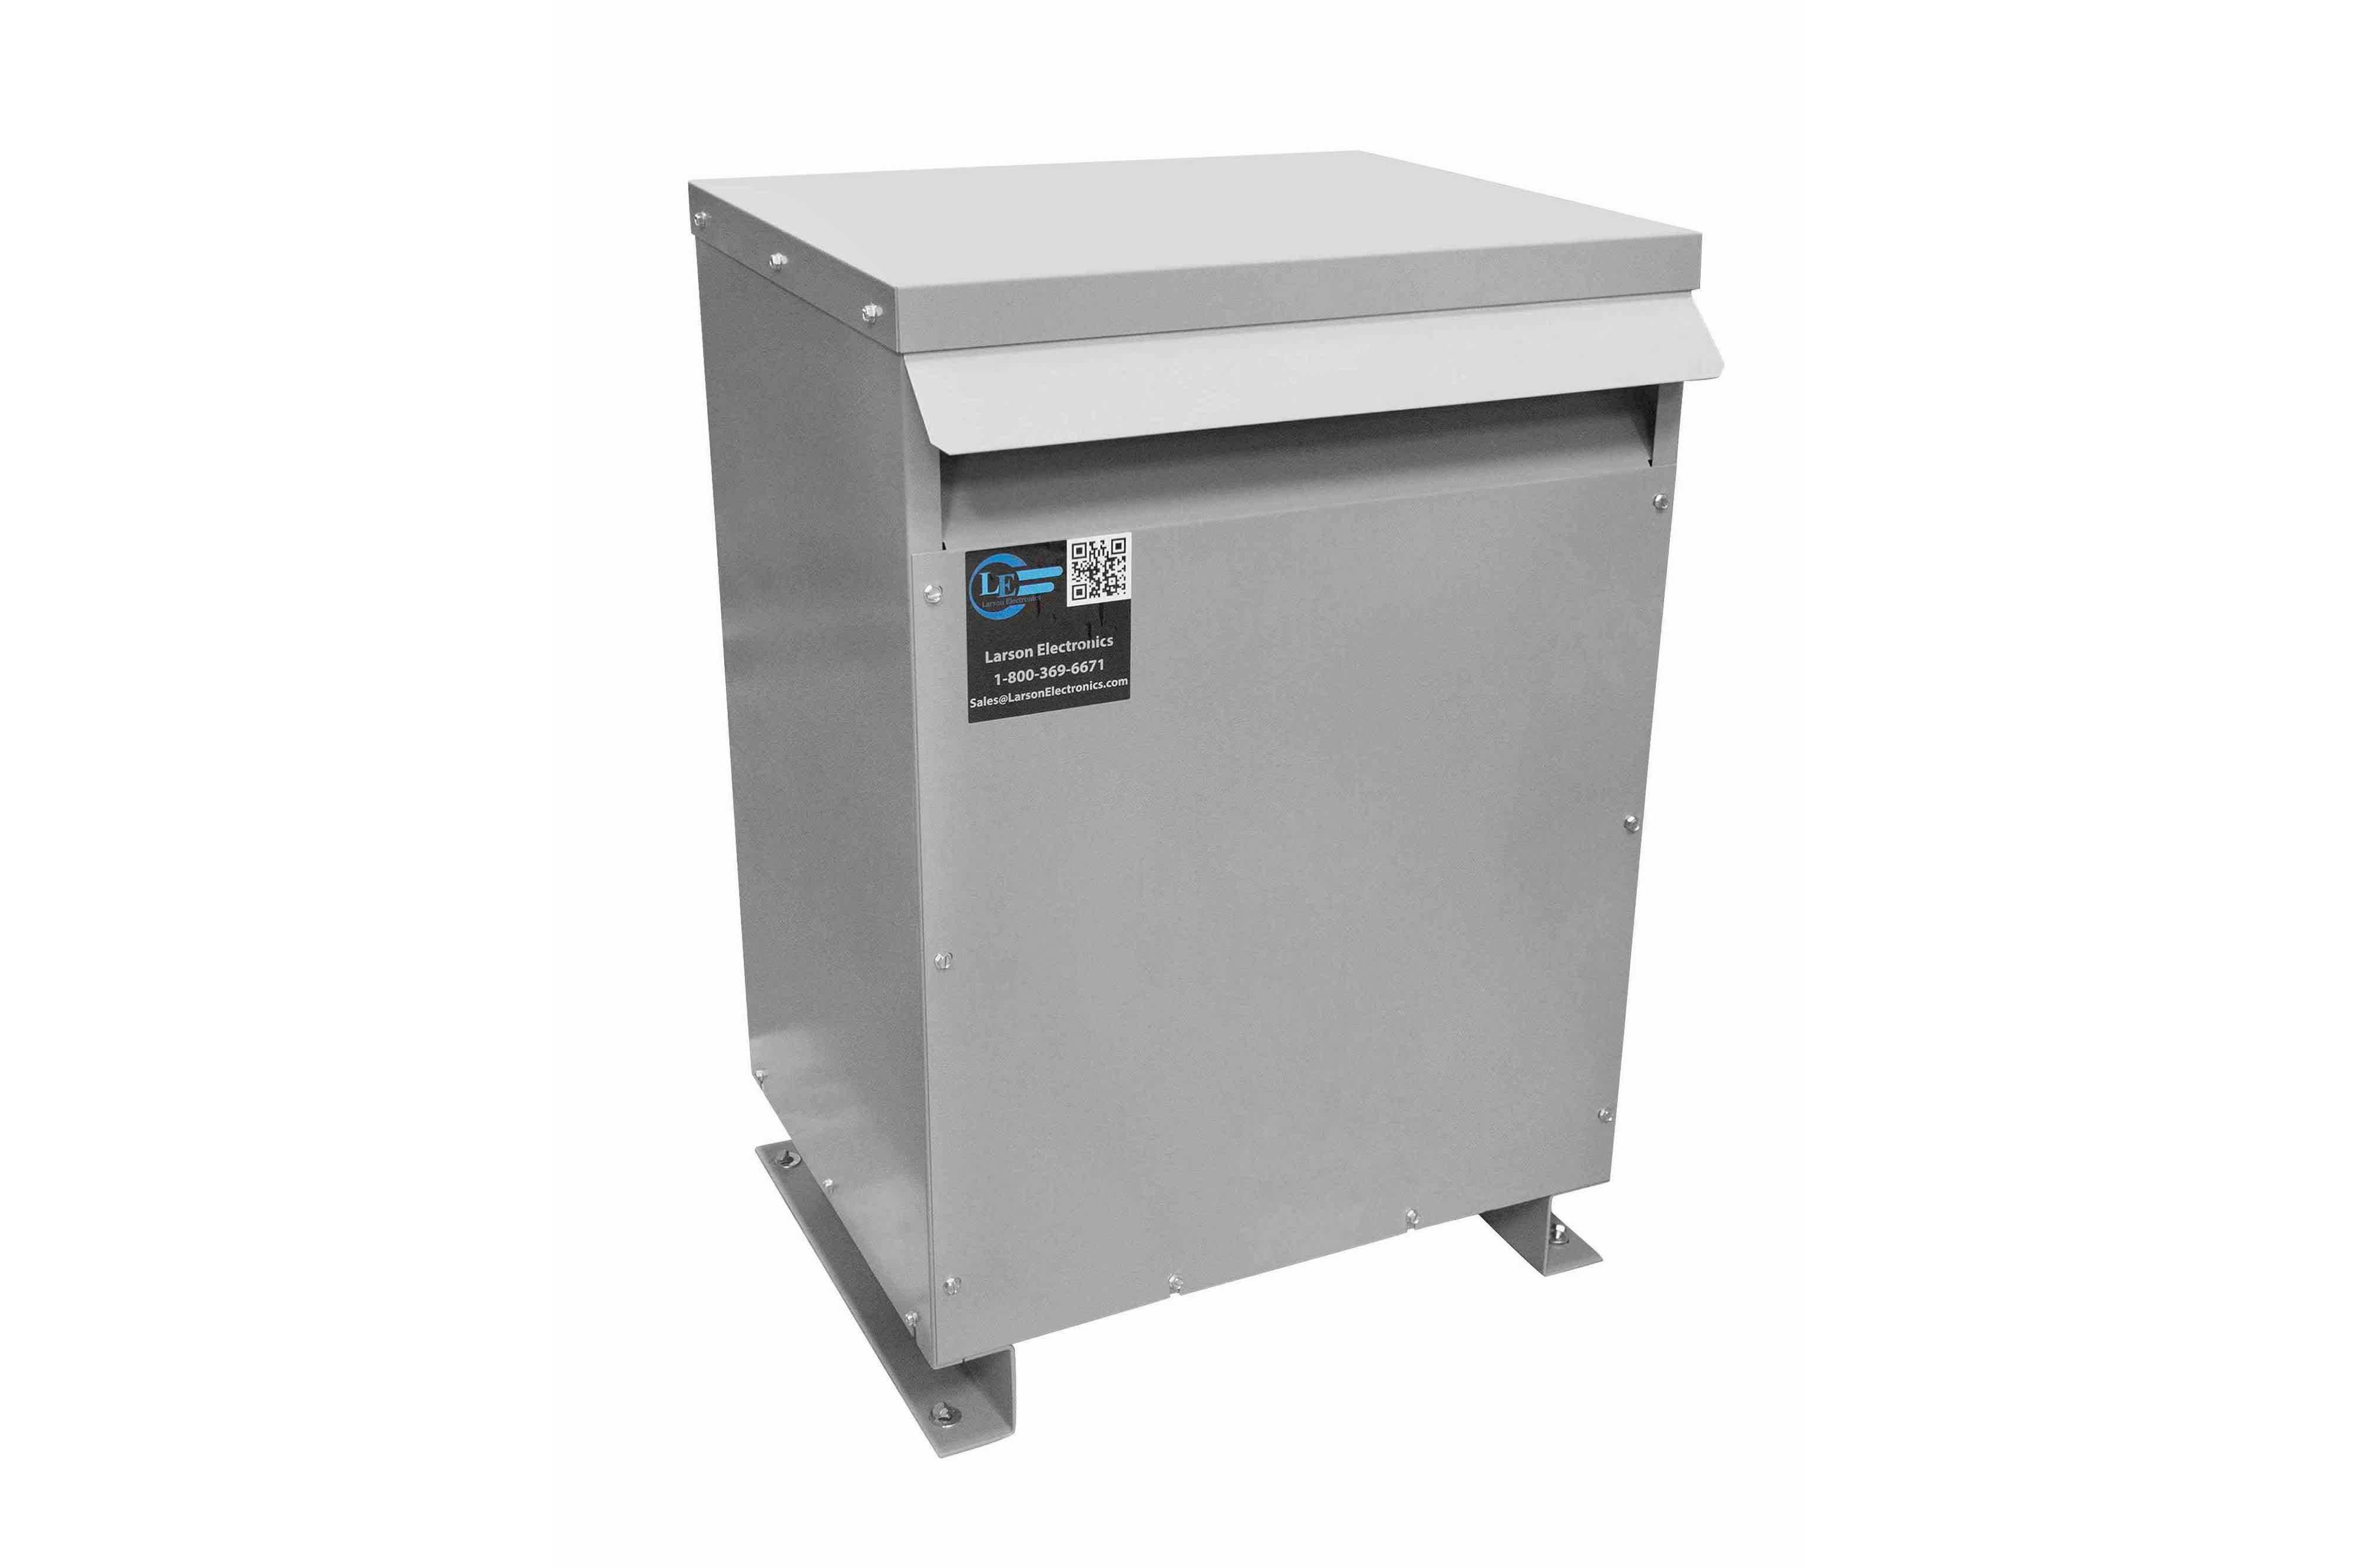 13 kVA 3PH Isolation Transformer, 400V Wye Primary, 480Y/277 Wye-N Secondary, N3R, Ventilated, 60 Hz